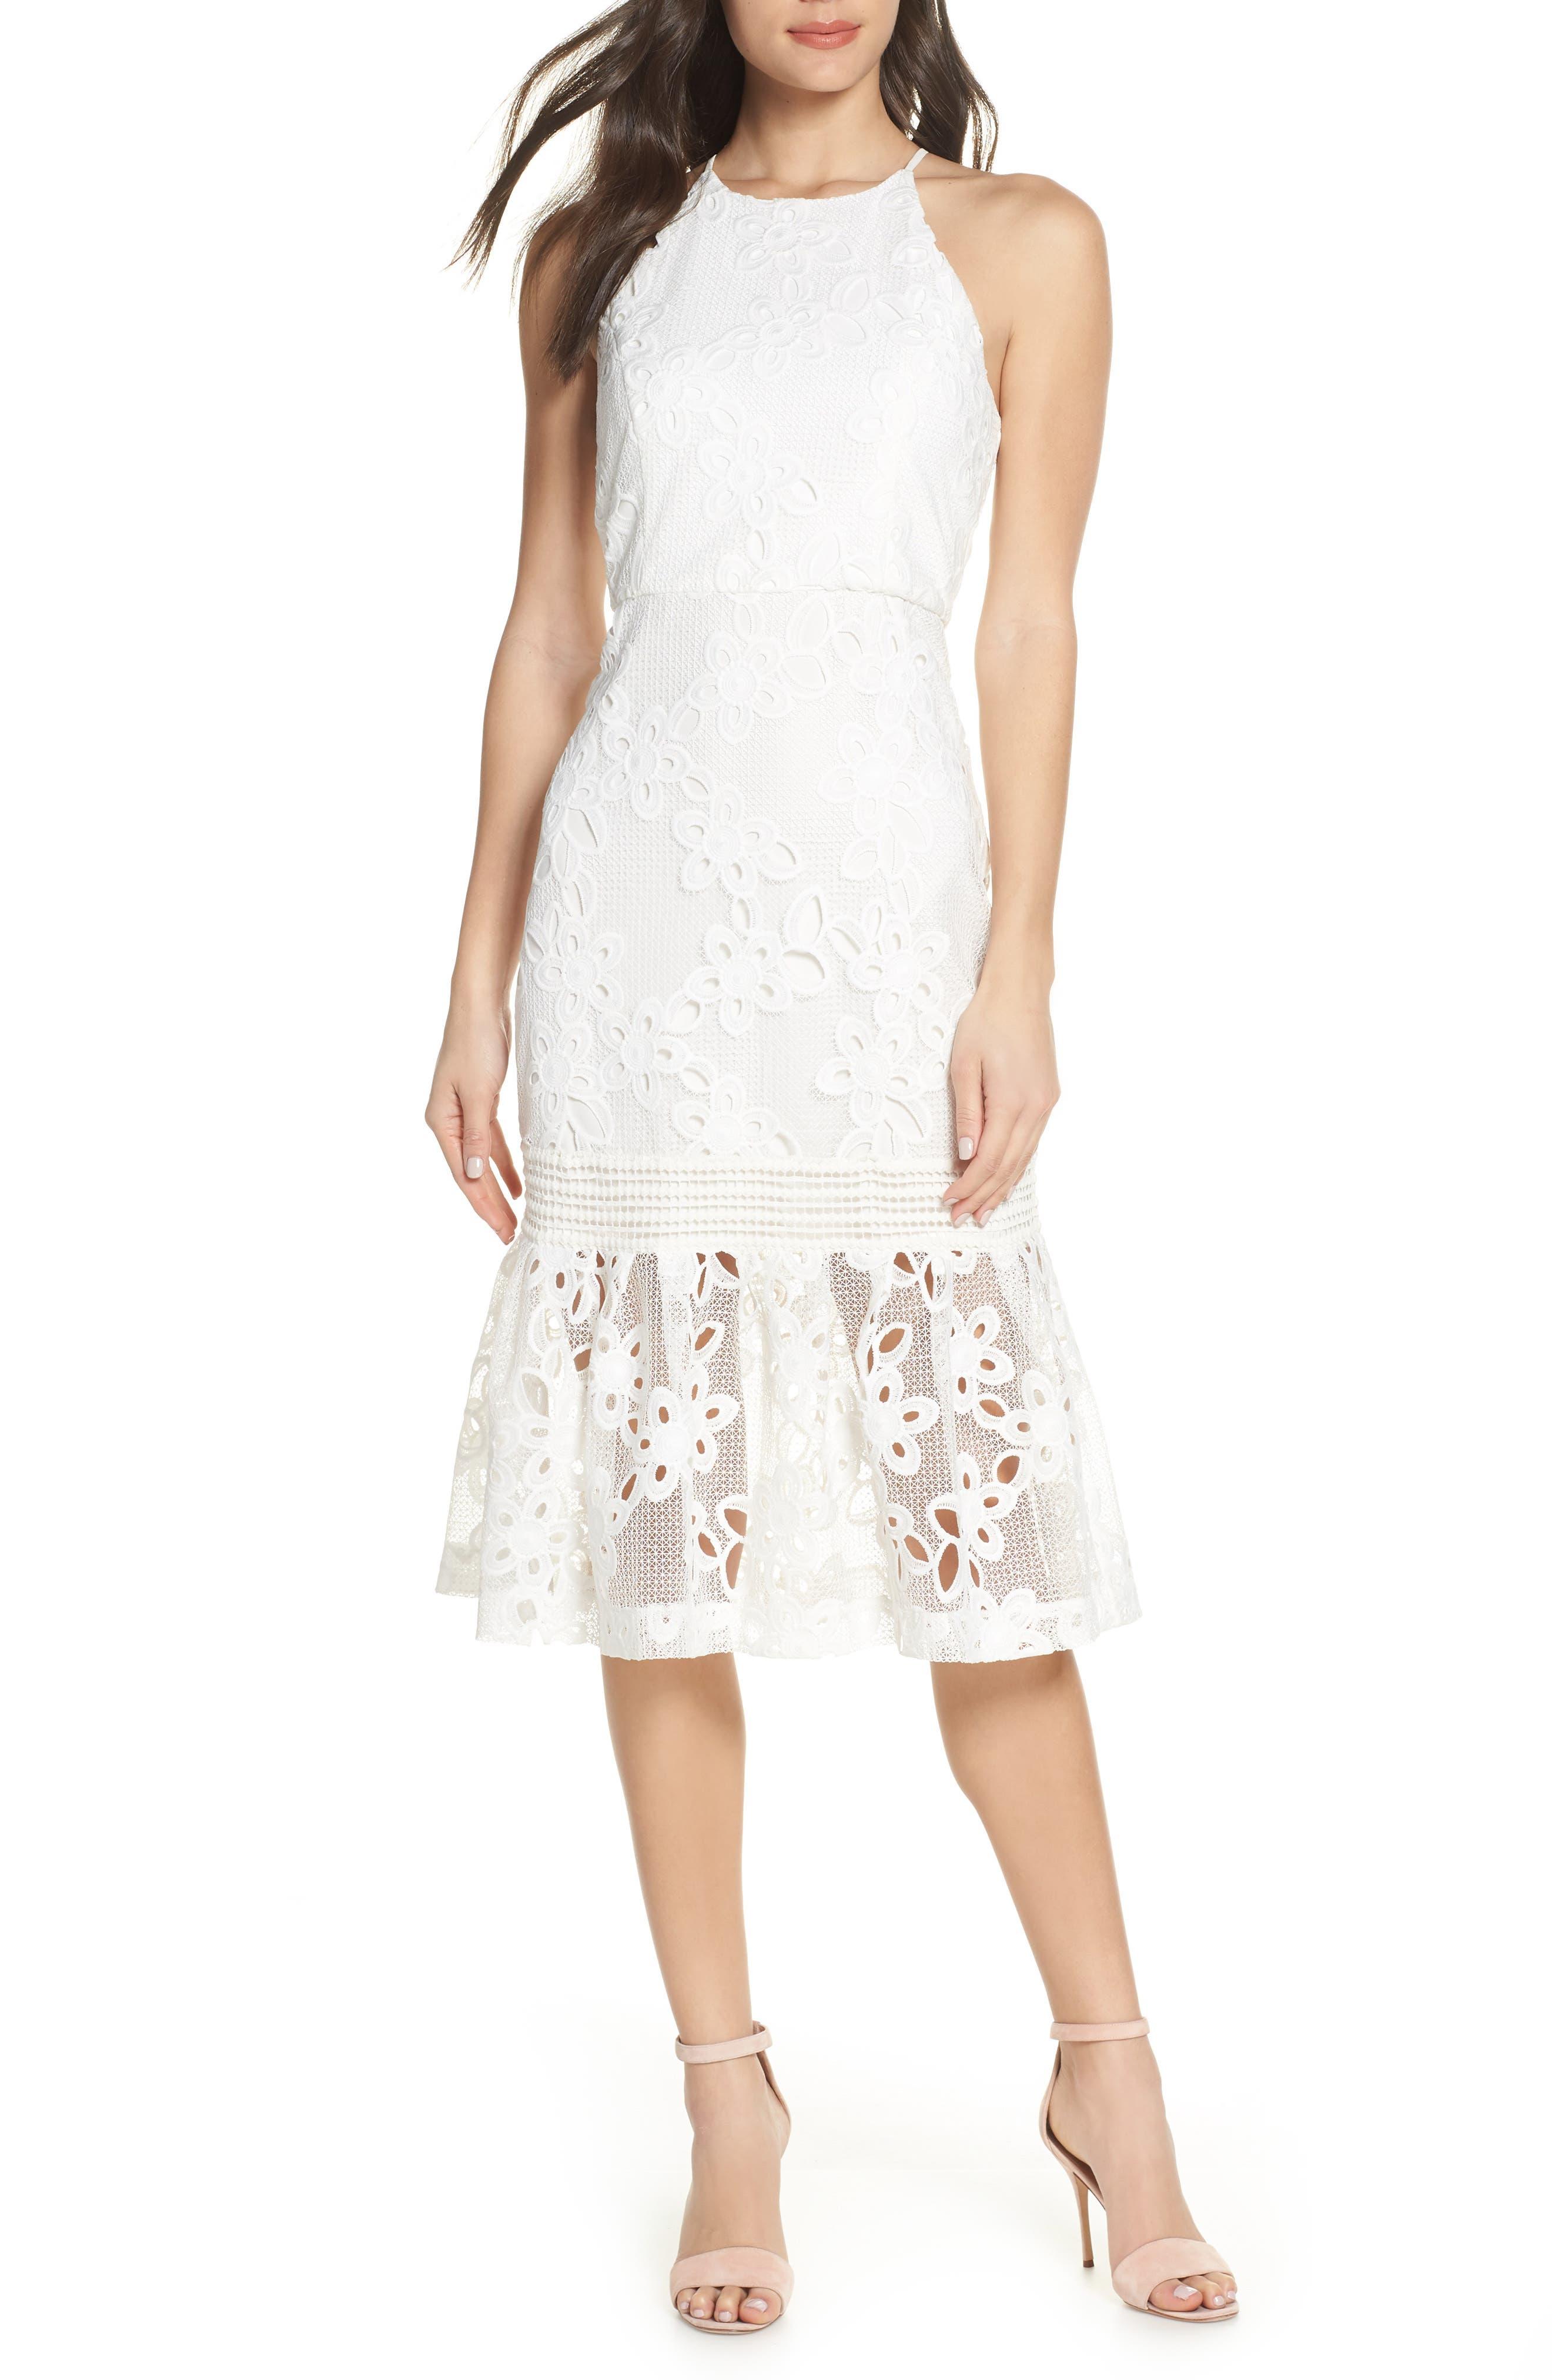 Mark + James By Badgley Mischka Lace Halter Dress, Ivory